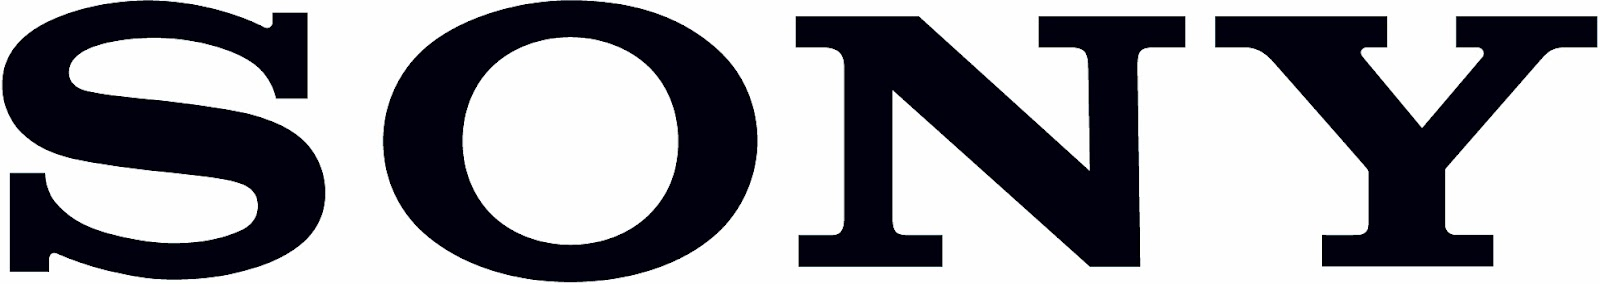 Agosto 2012 analisis tv led - Sony bravia logo hd ...